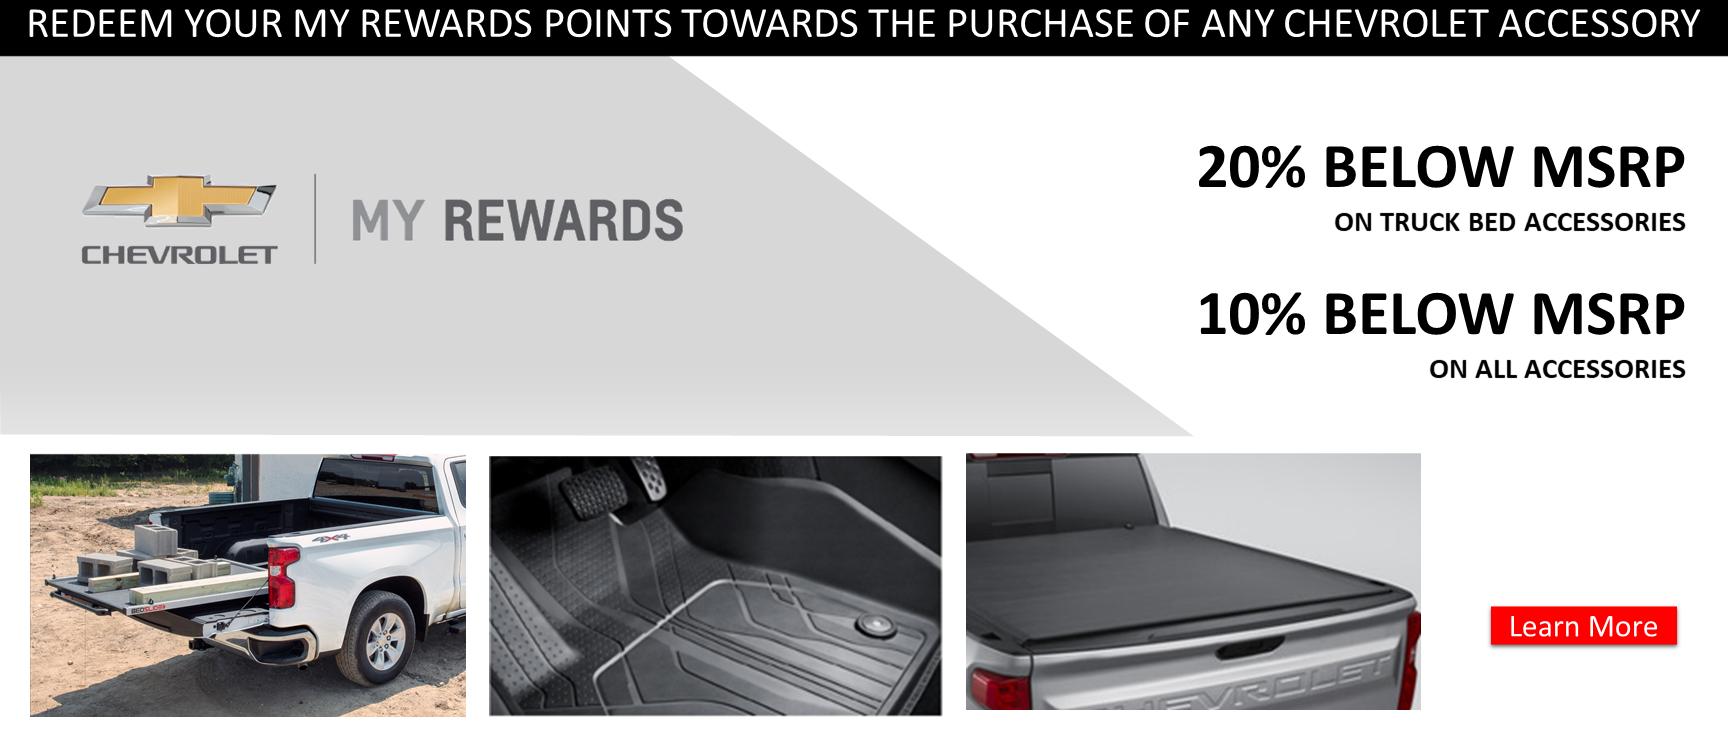 Dealer Website Banners (October 2021) Chevrolet (1800×760)